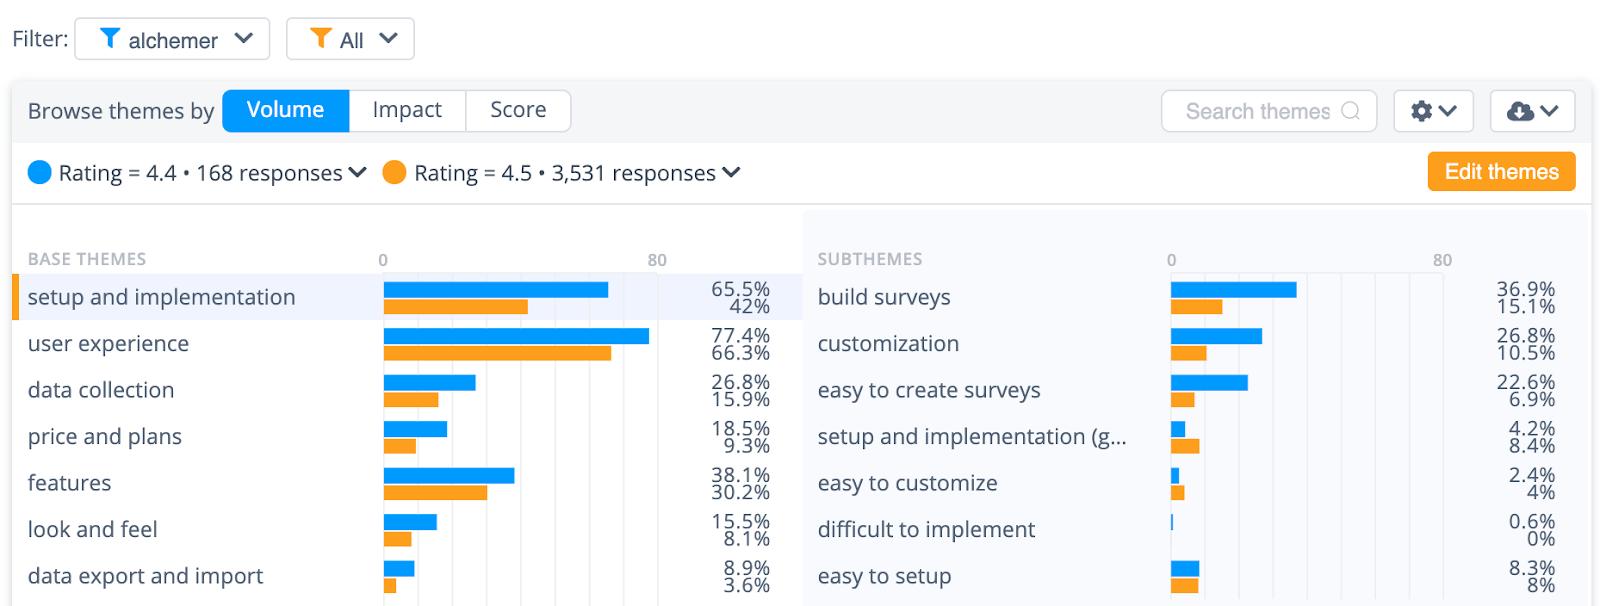 Alchemer survey tool analysis: Setup and implementation theme data